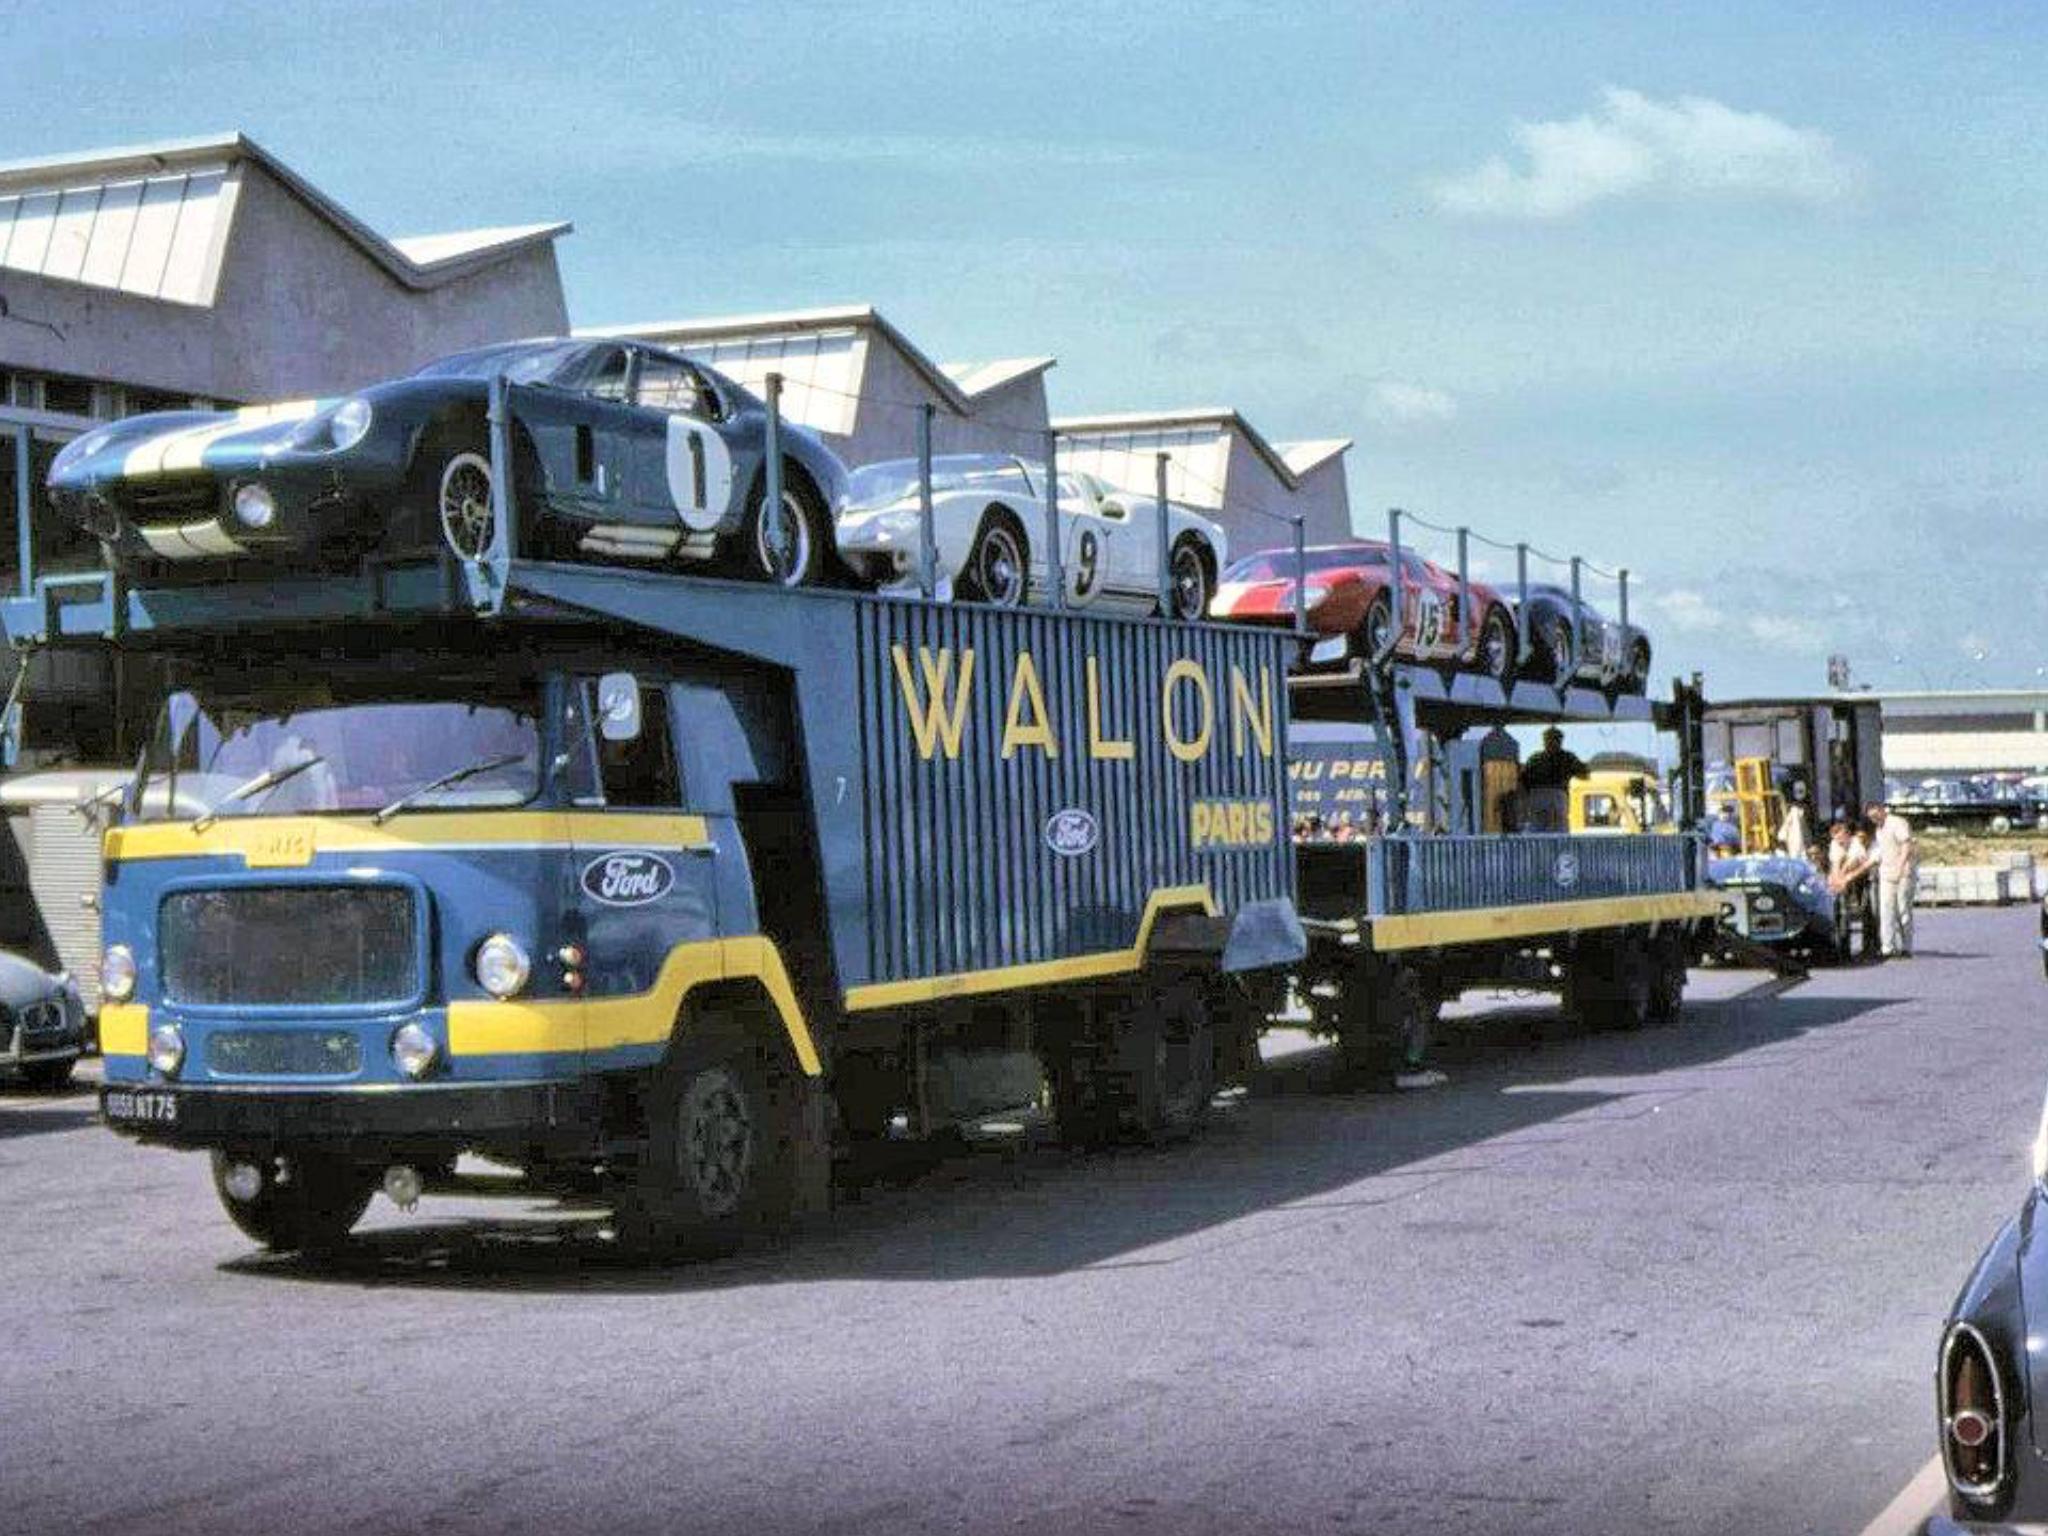 Lemans 1965 In 2020 Le Mans Car Trailer Trucks